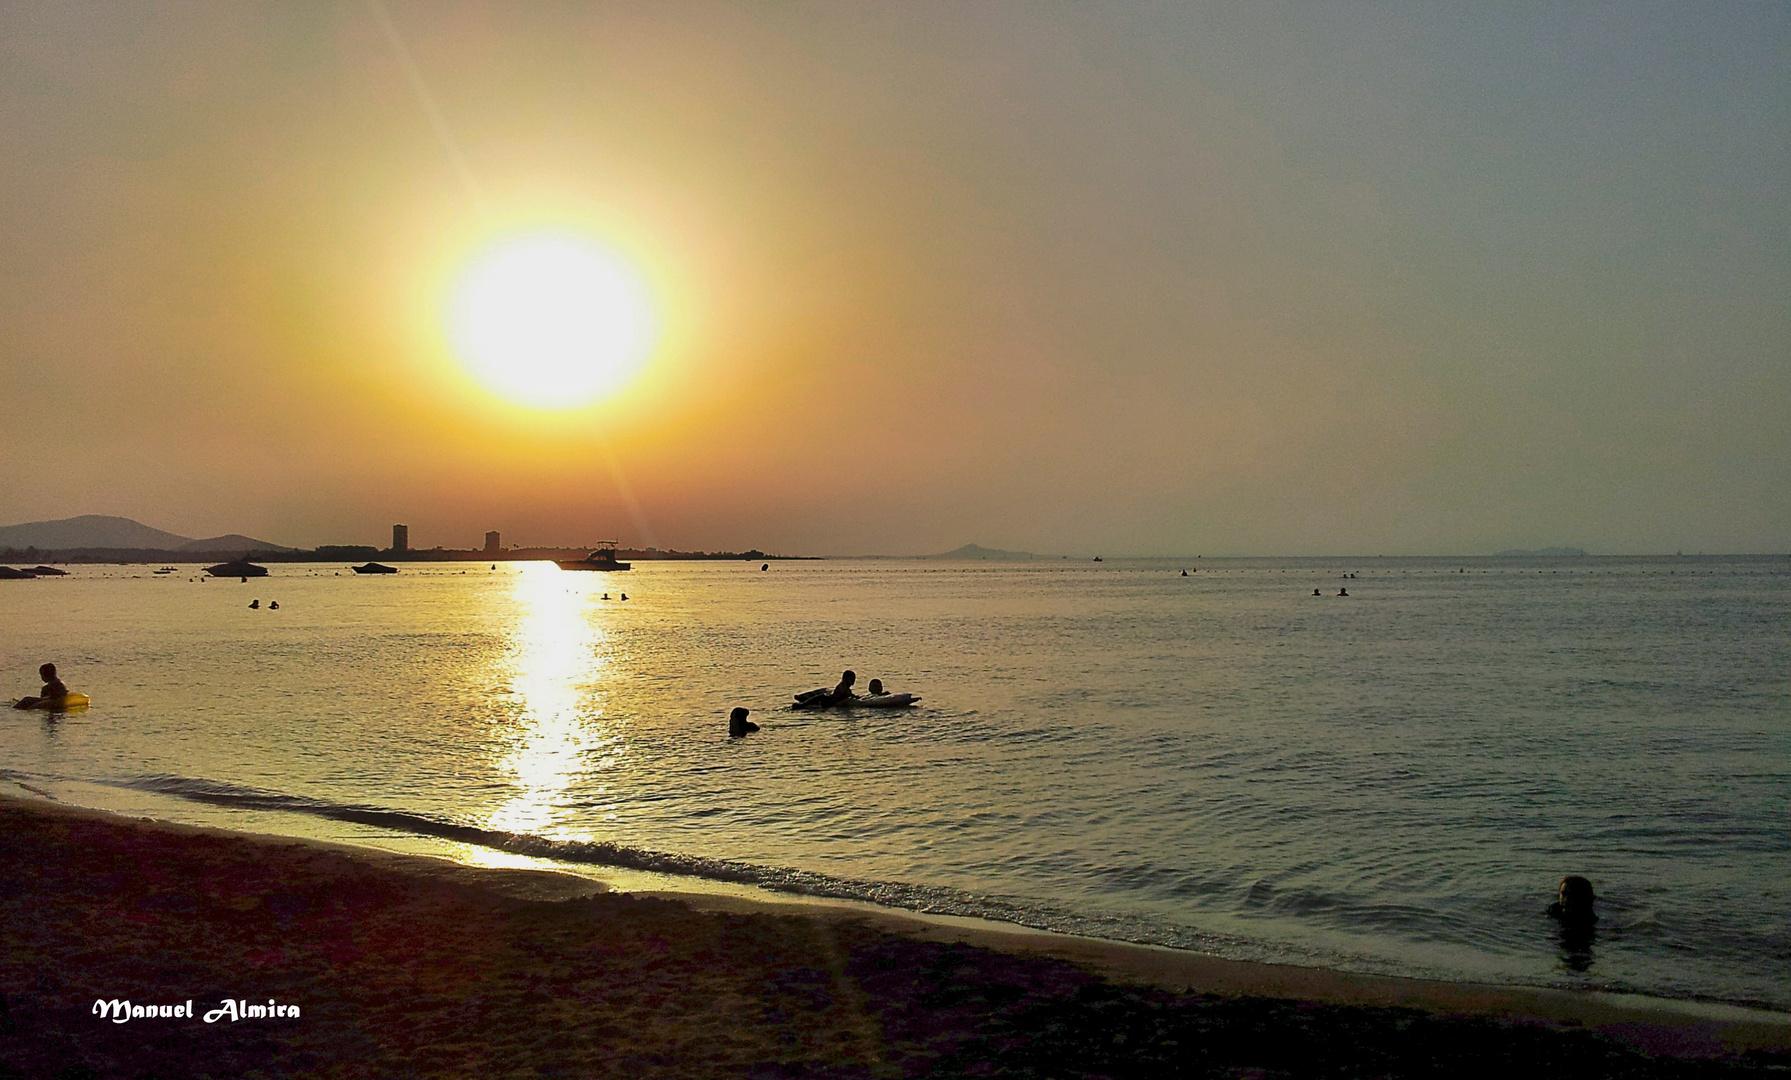 Atardecer en La Manga del Mar Menor